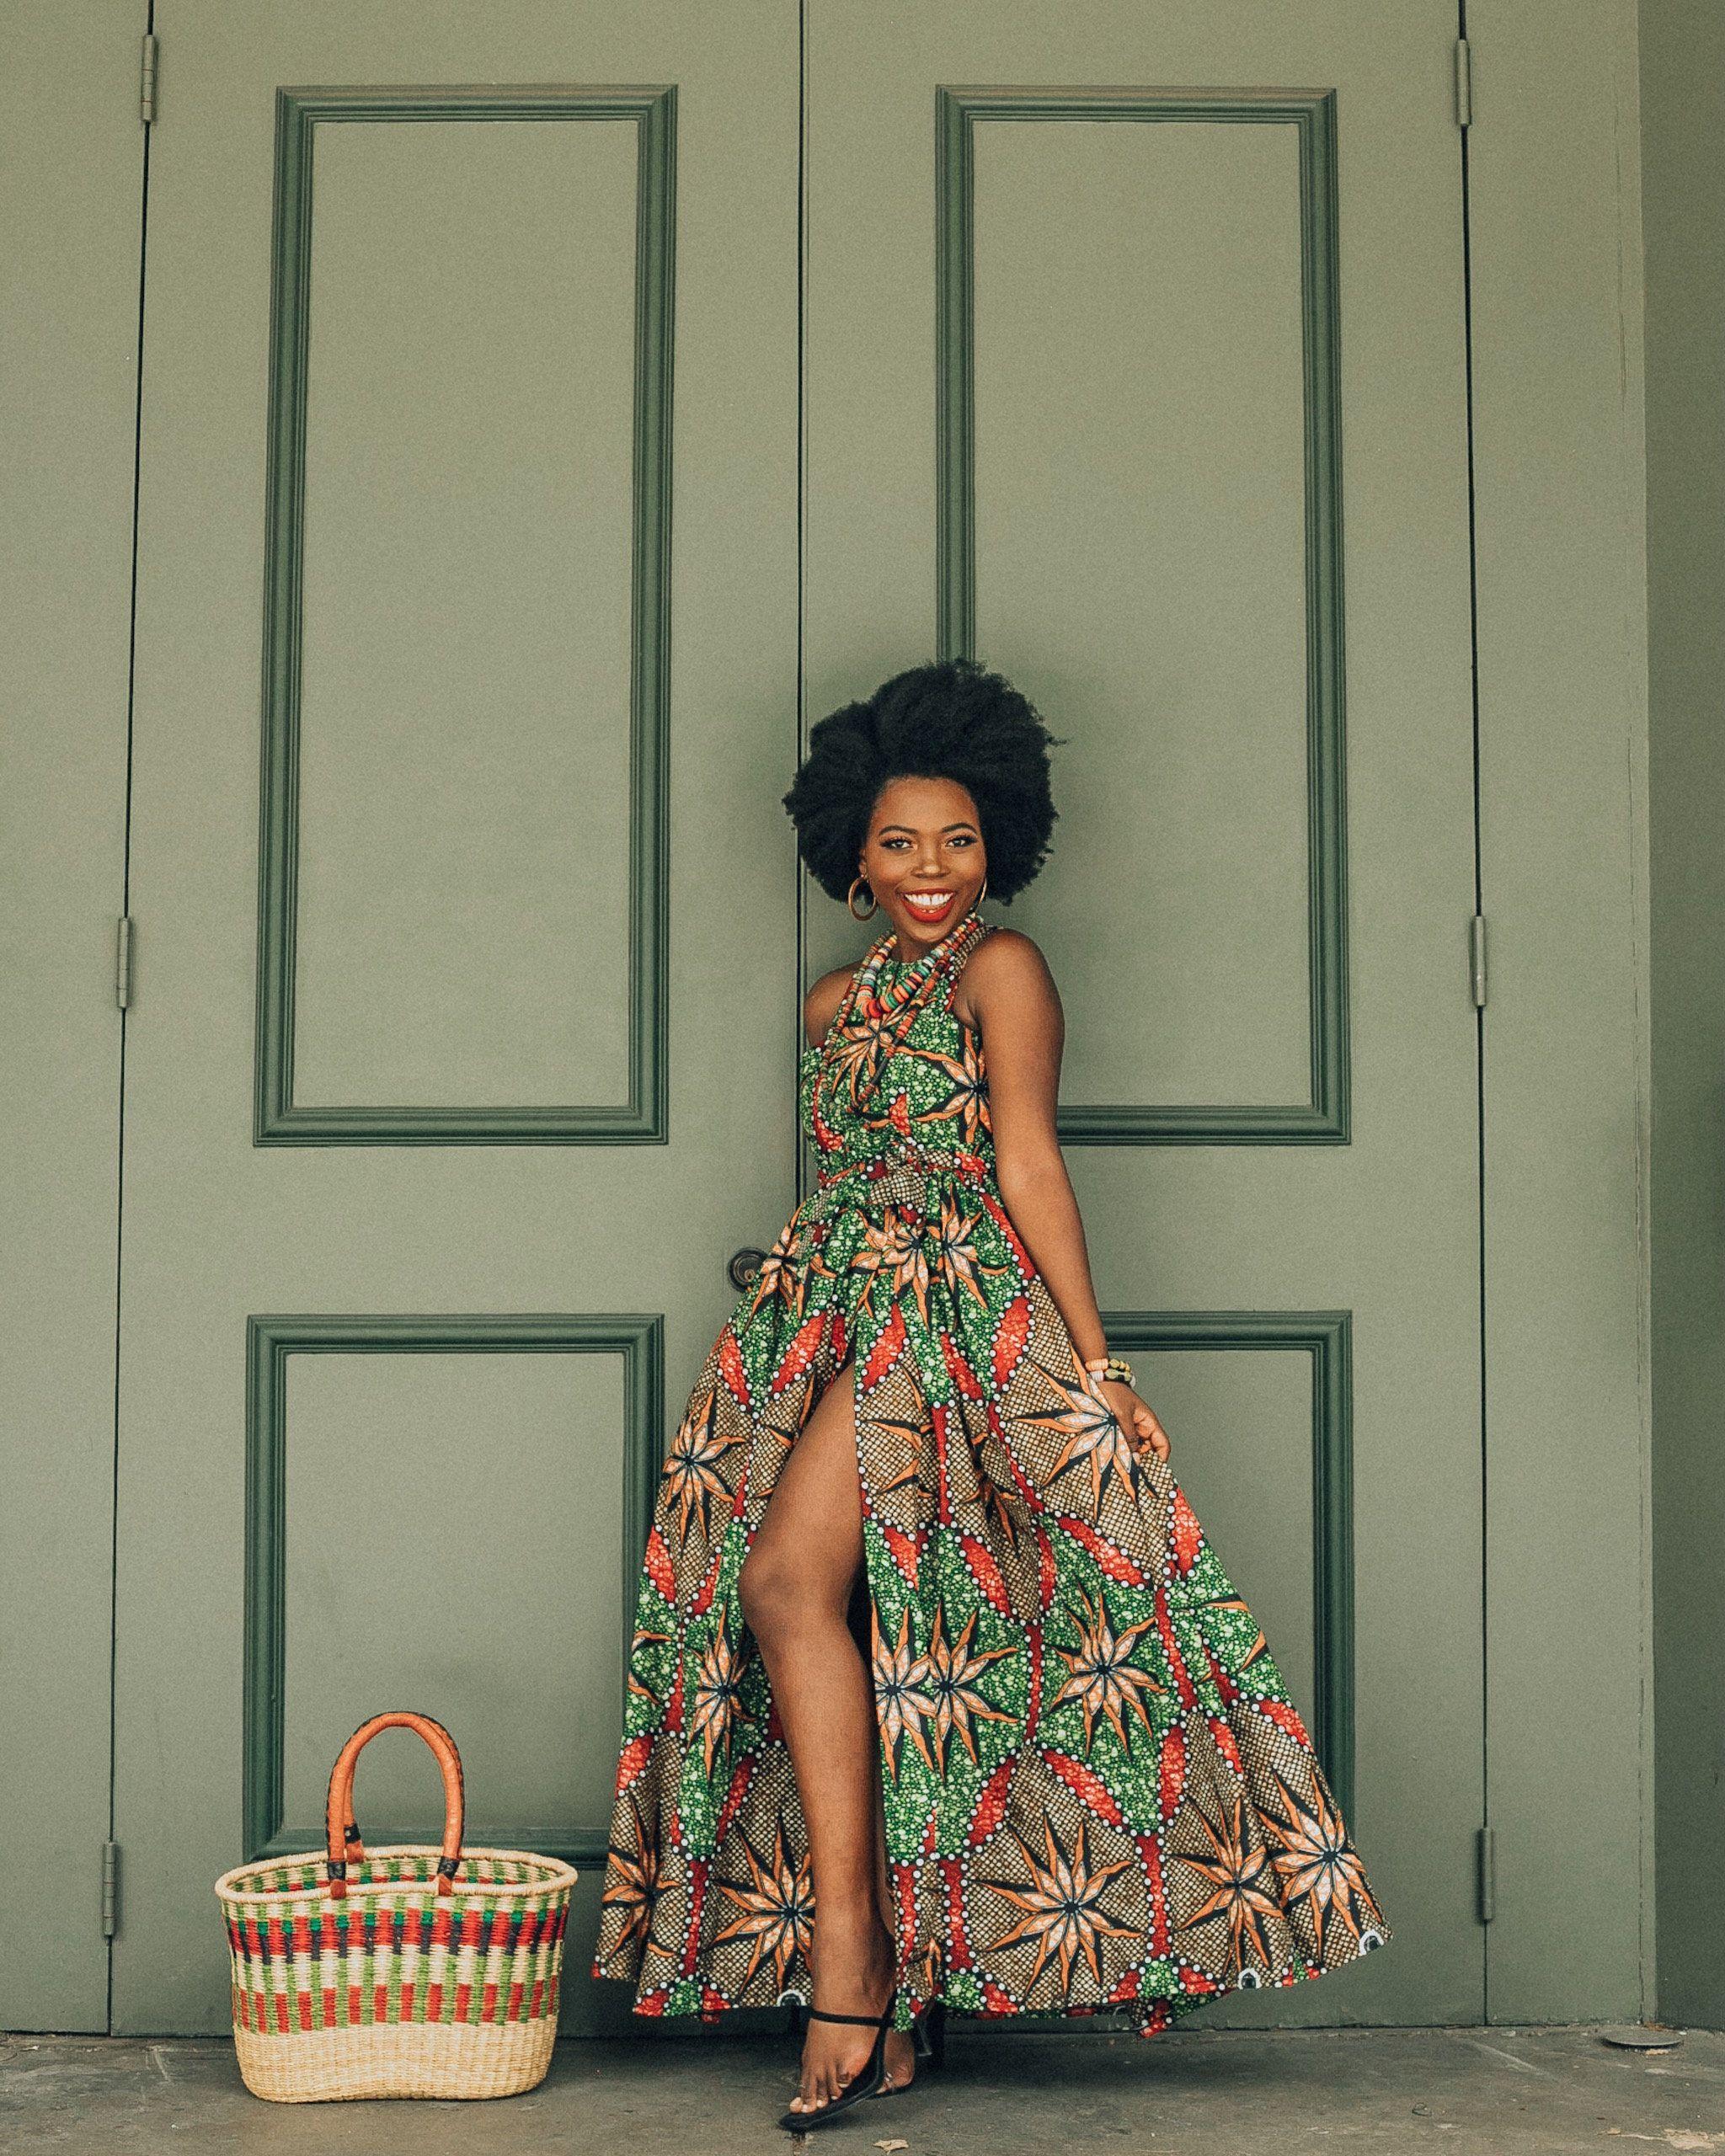 Ankara Dress African Clothing African Dress African Print Dress African Fashion Women S Clothin African Fashion Women Clothing African Clothing African Fashion [ 2560 x 2048 Pixel ]